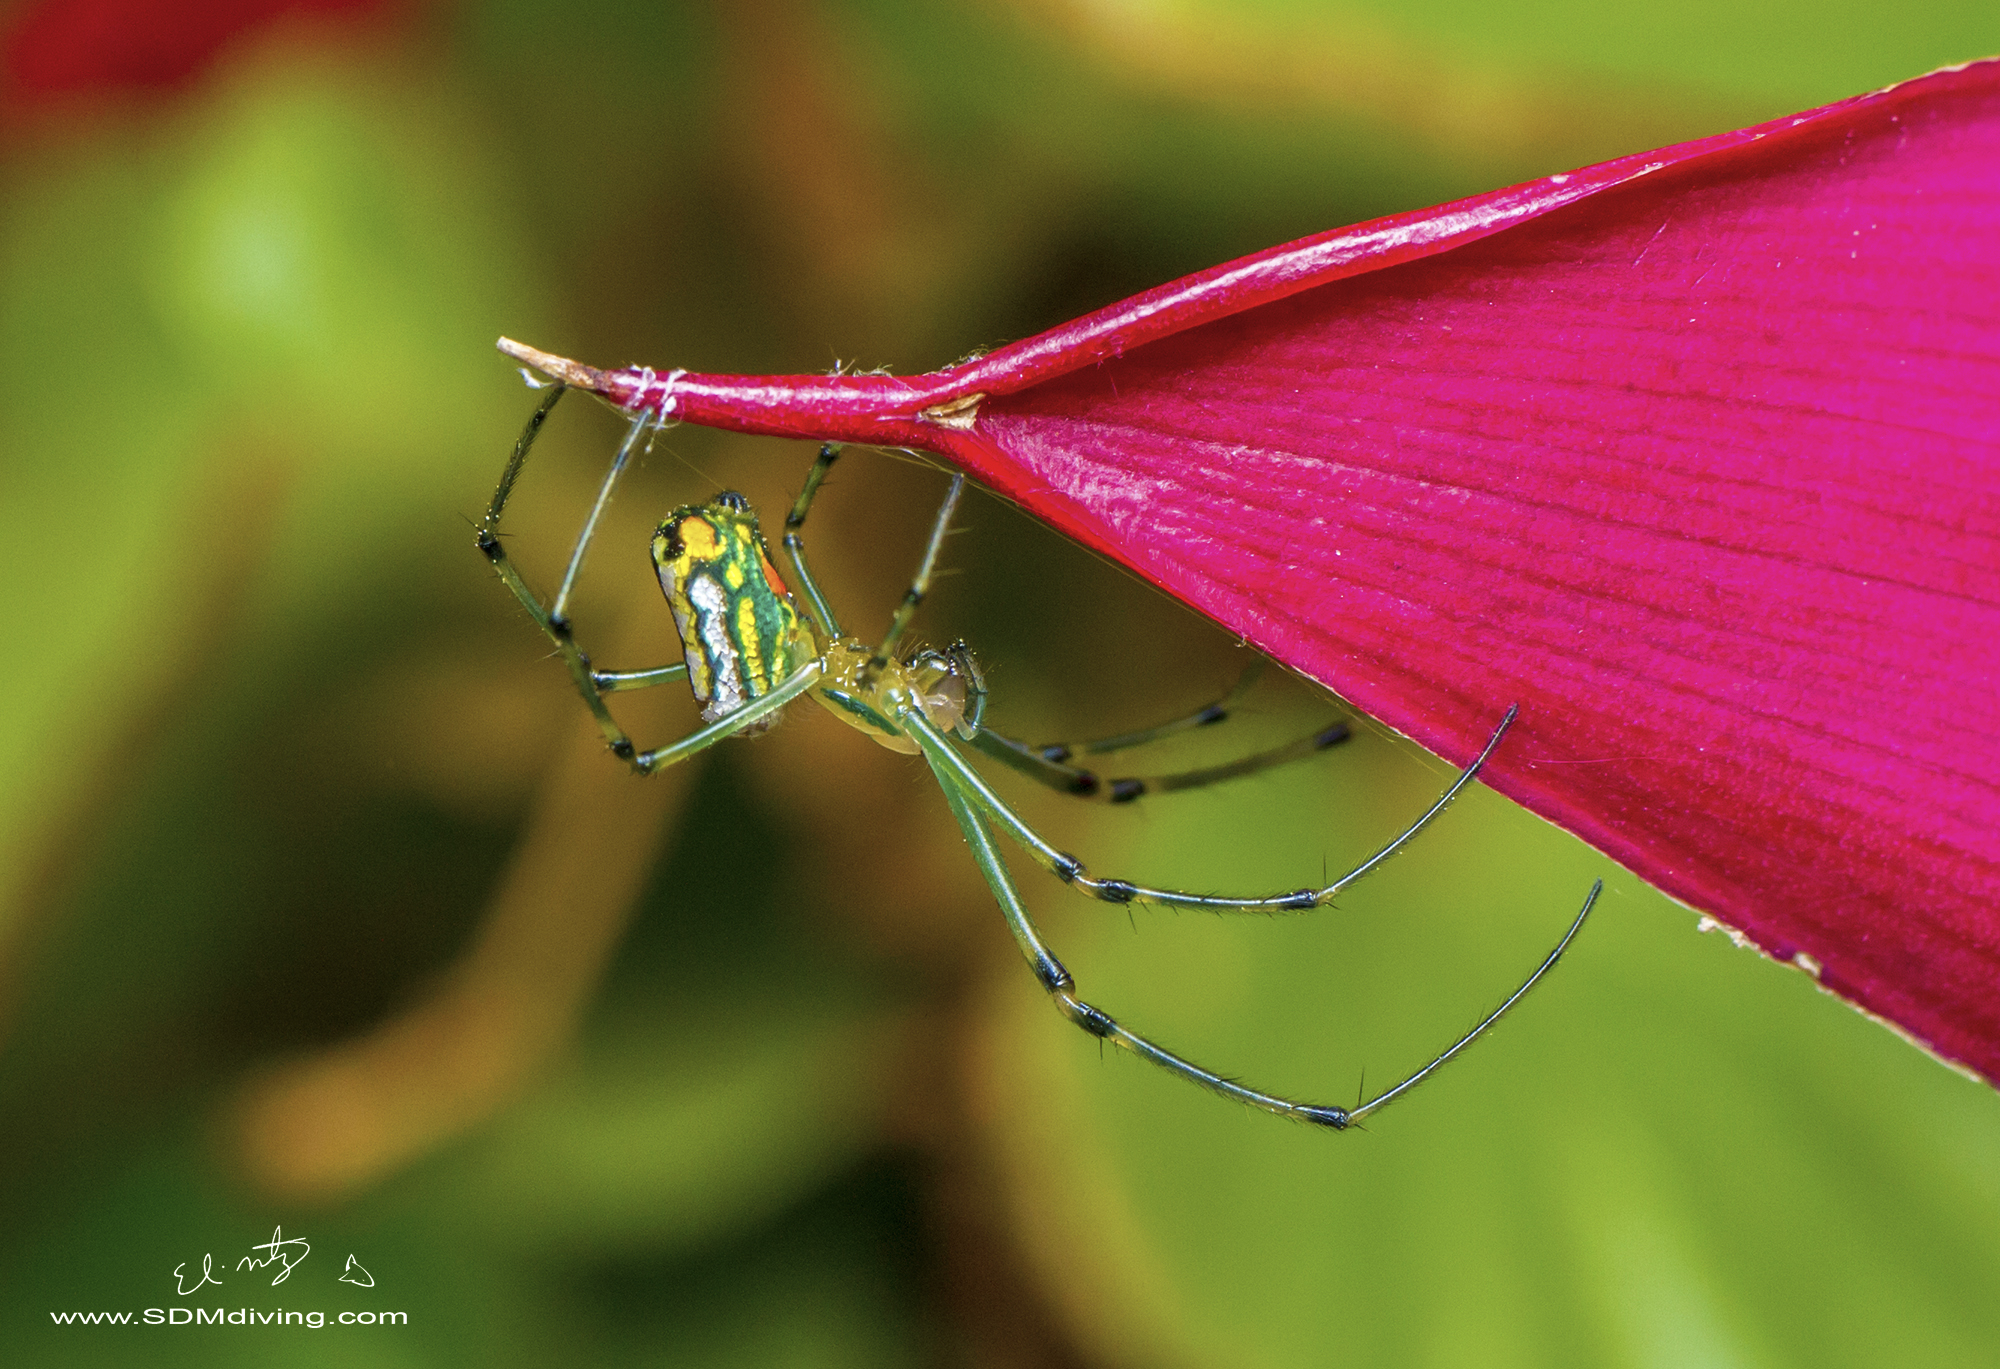 14. Orchard spider